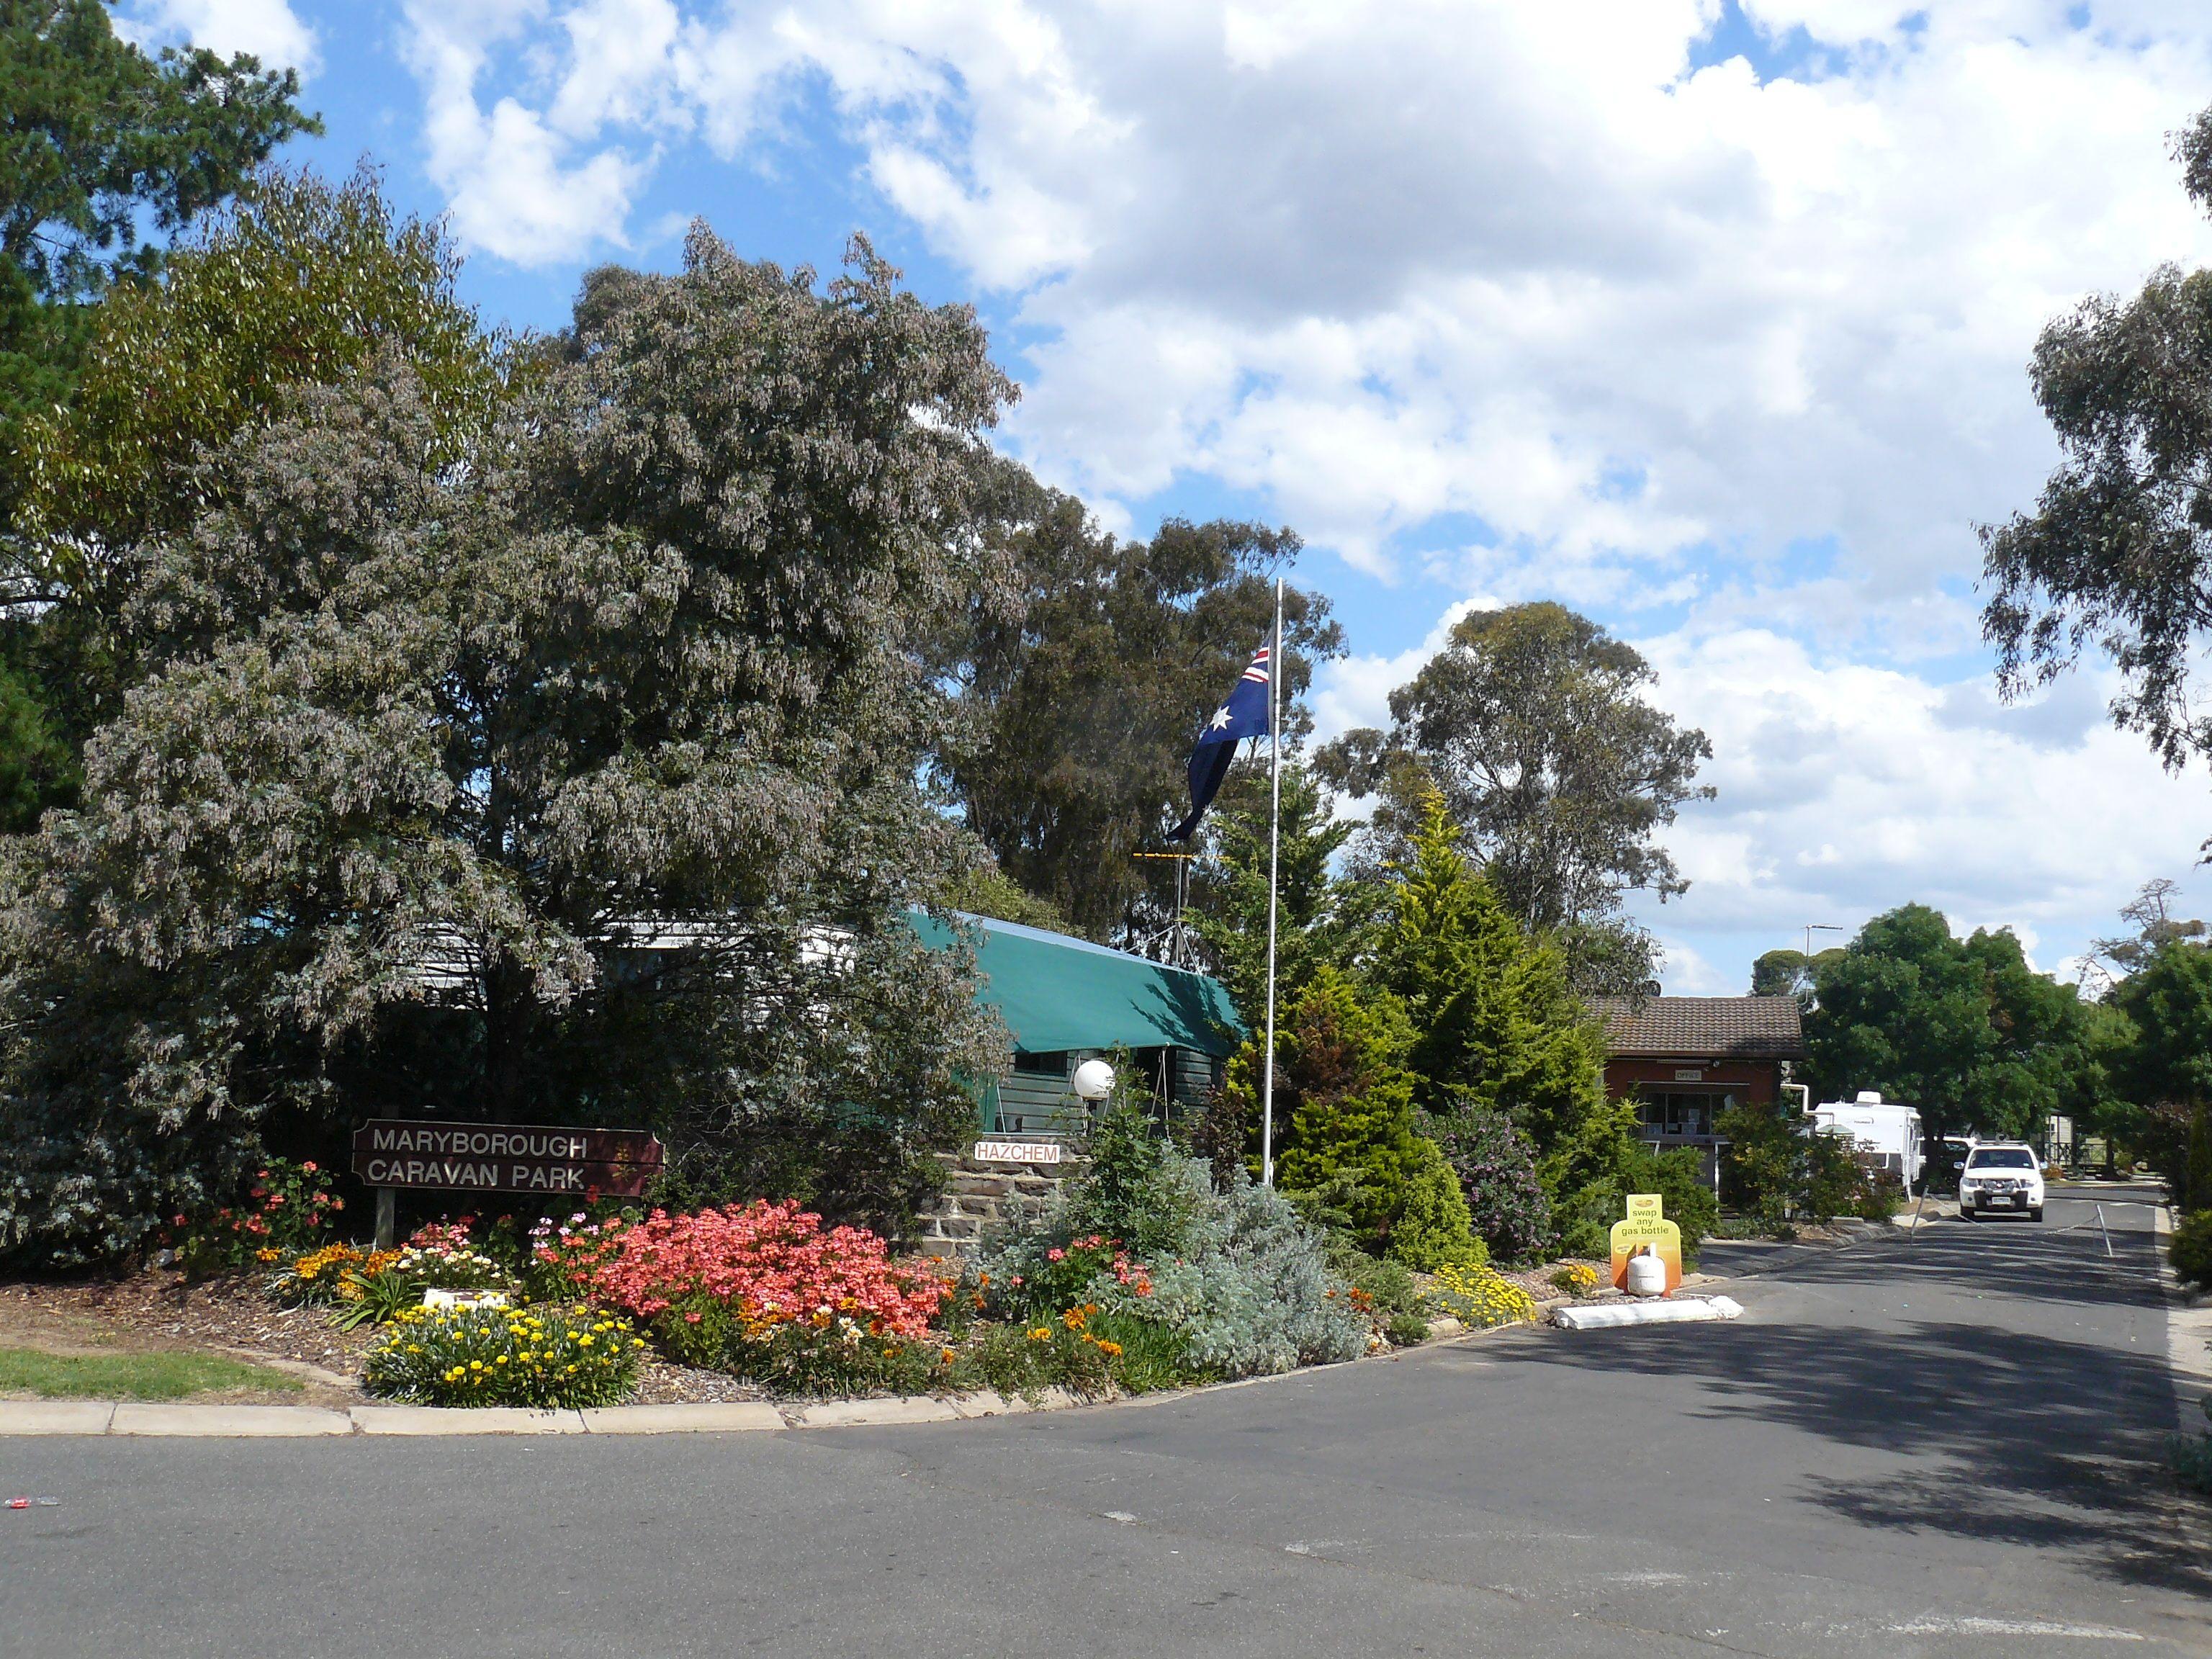 Maryborough in Victoria